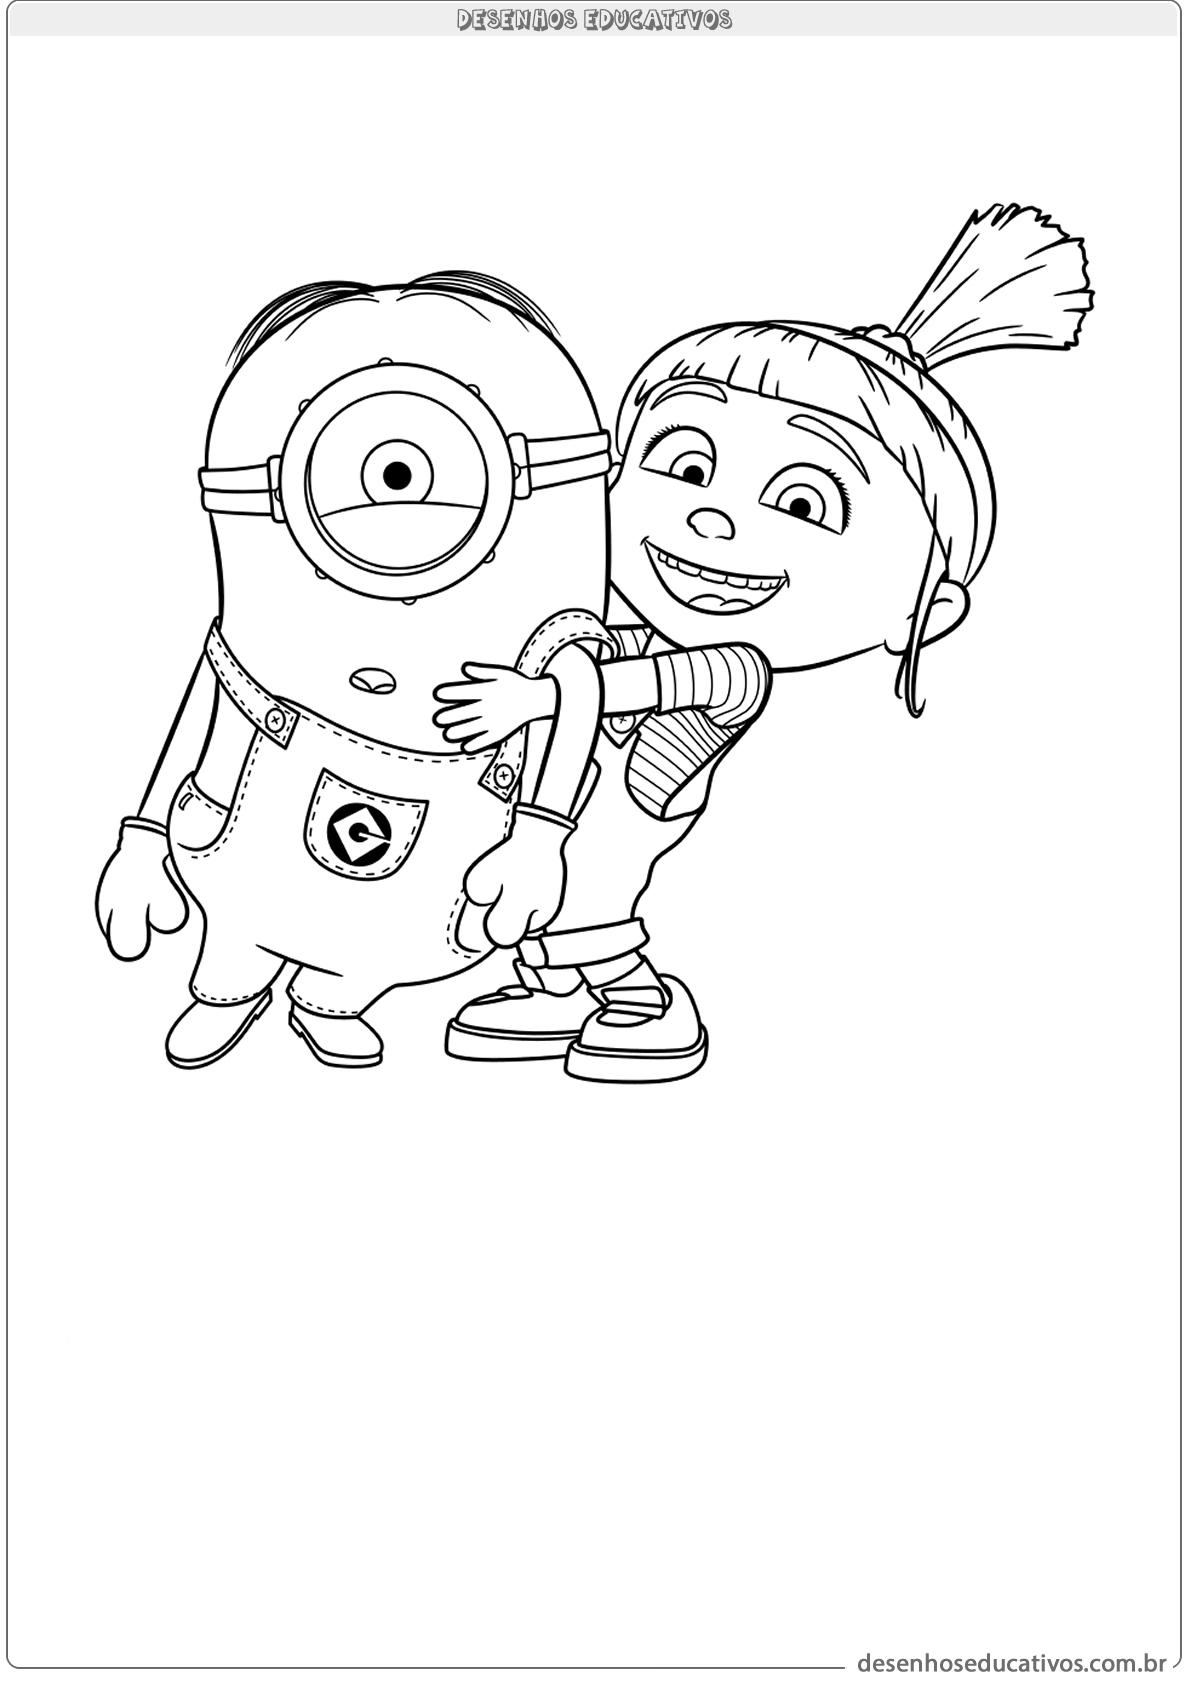 Vamos Pintar Os Minions Desenhos Educativos